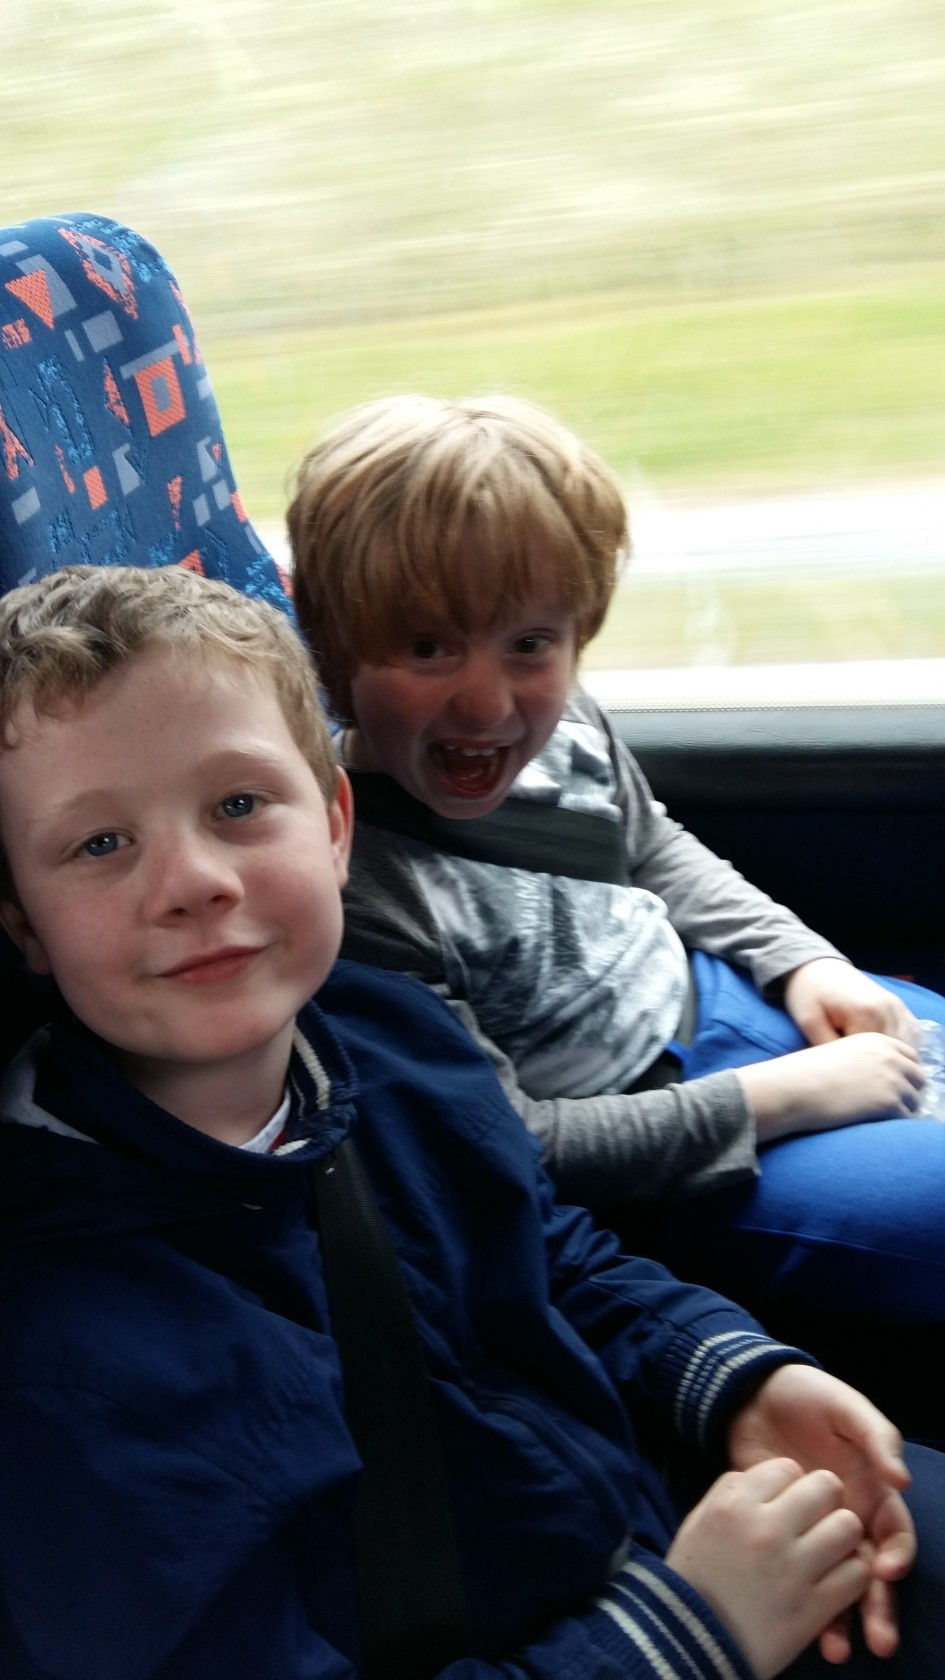 Shane & Liam